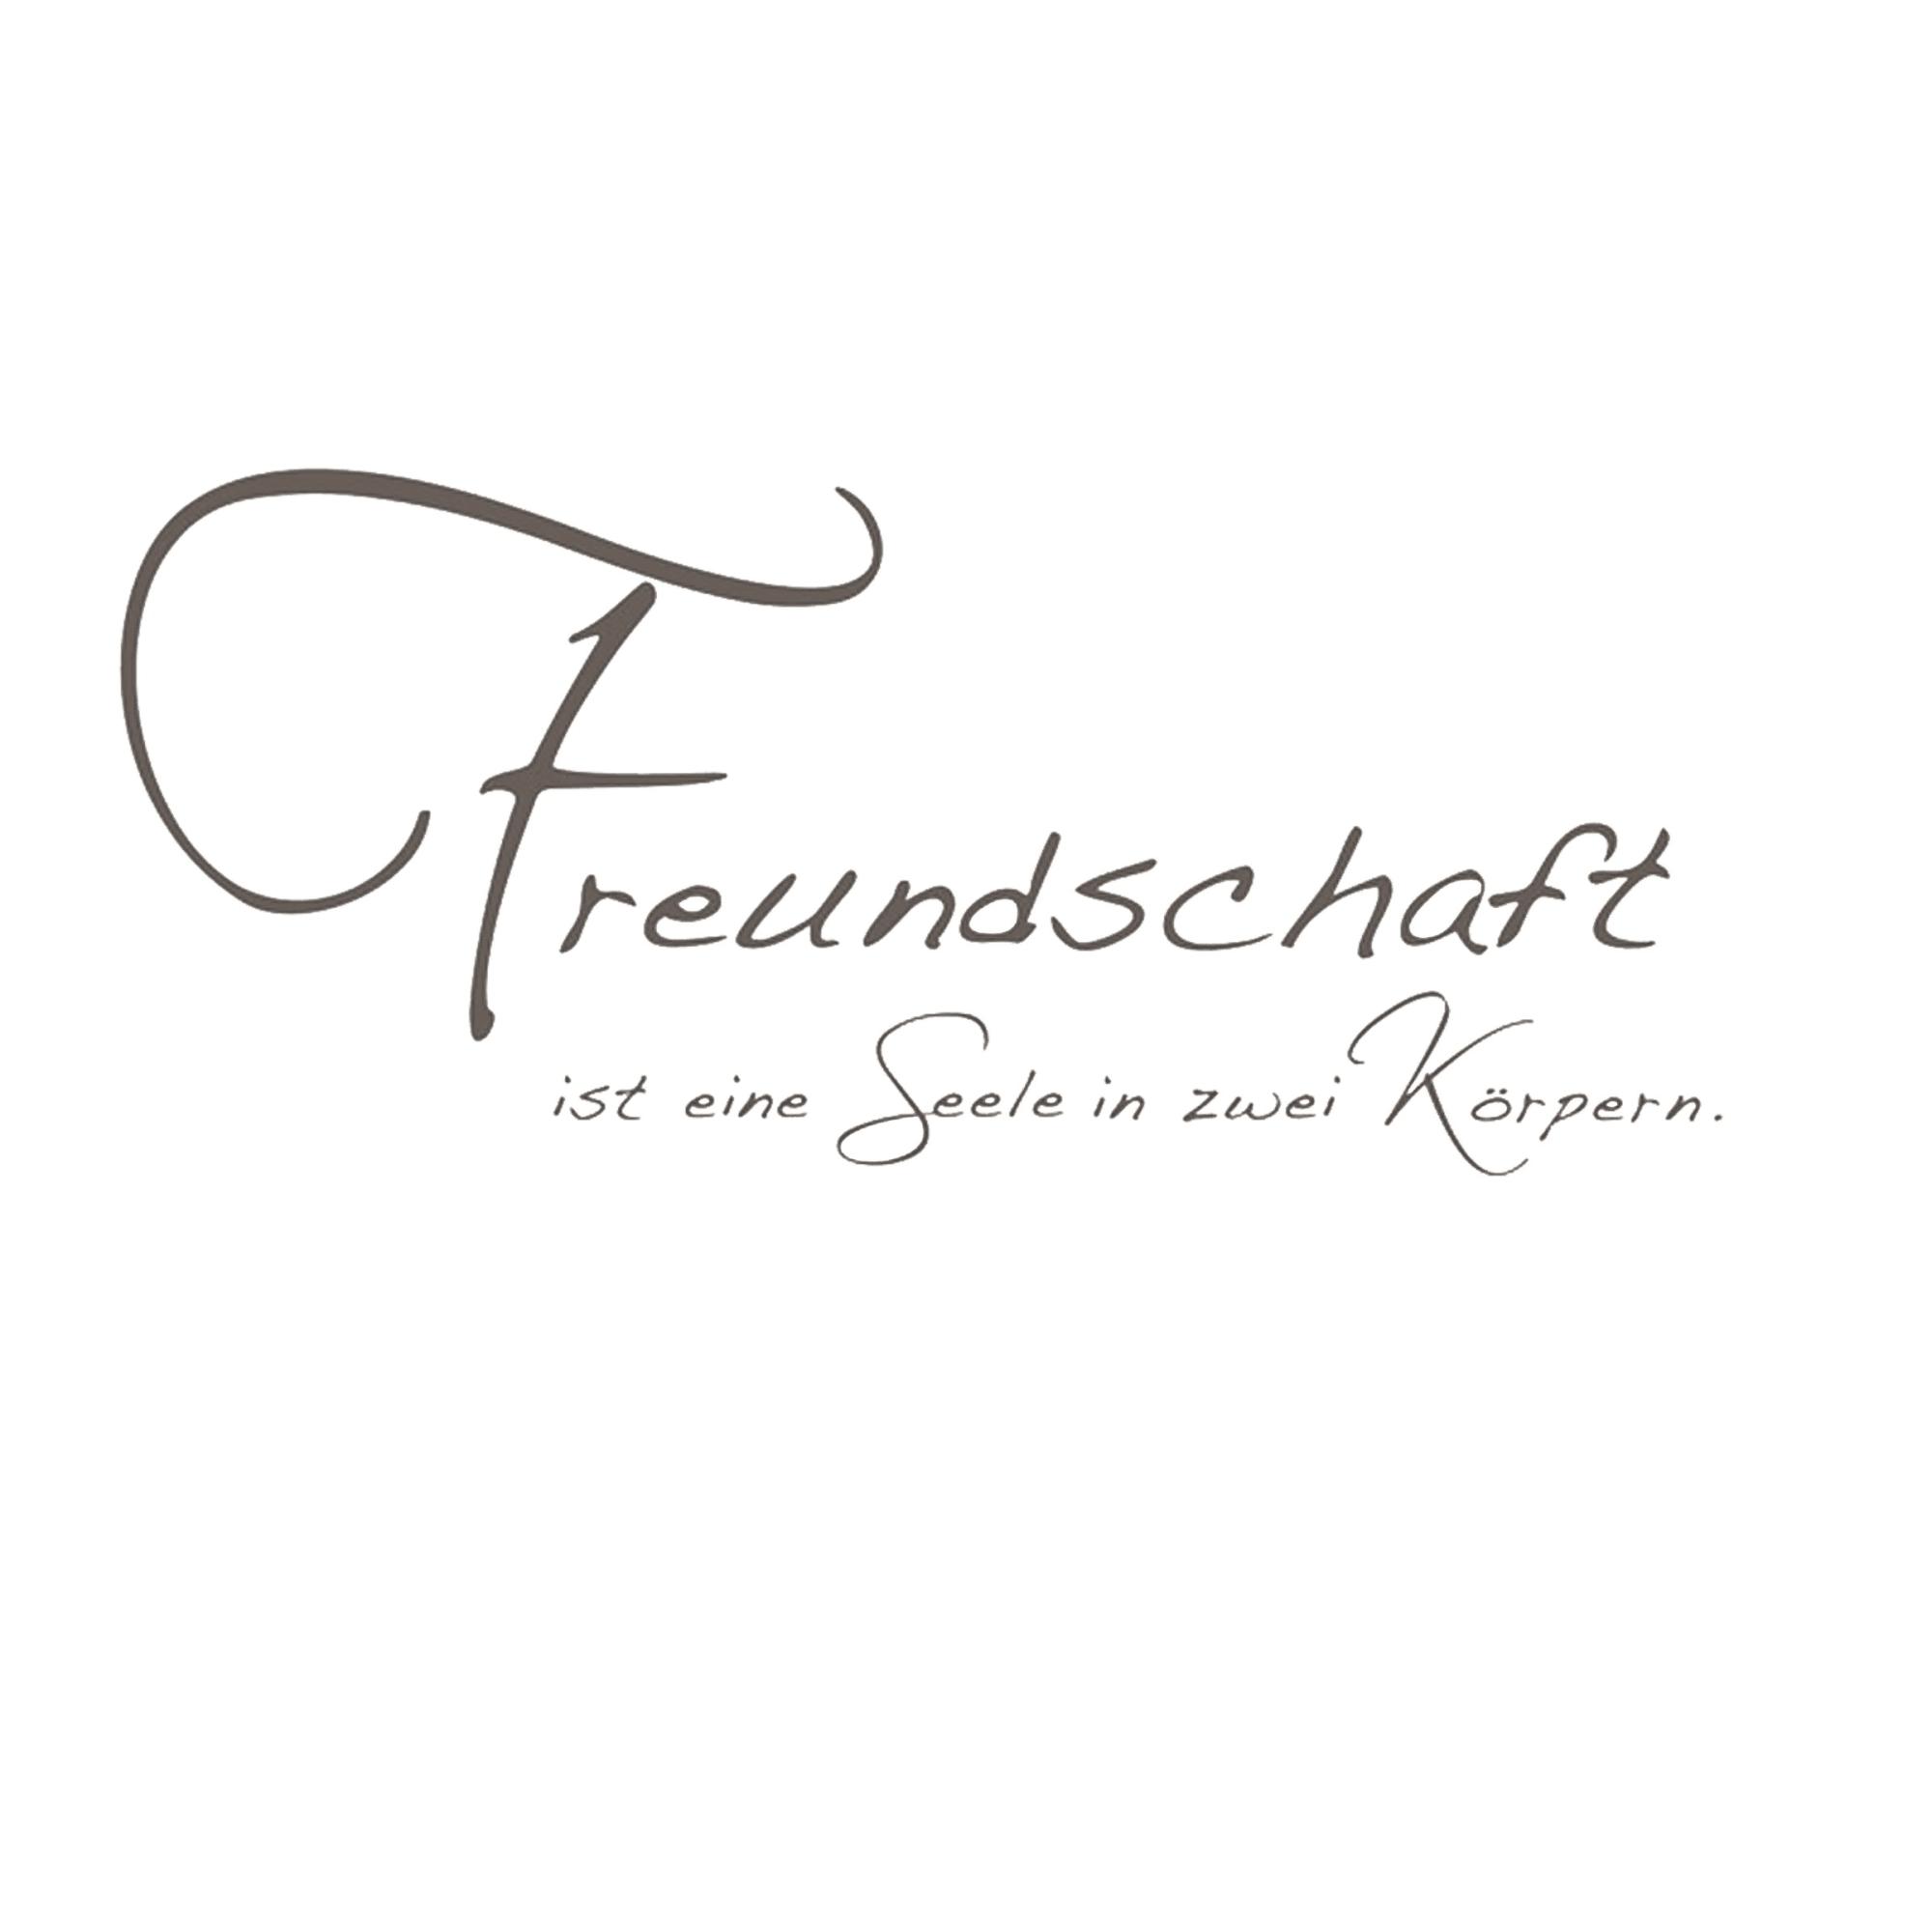 Charmant Freundschaft Rahmen Galerie - Bilderrahmen Ideen - szurop.info